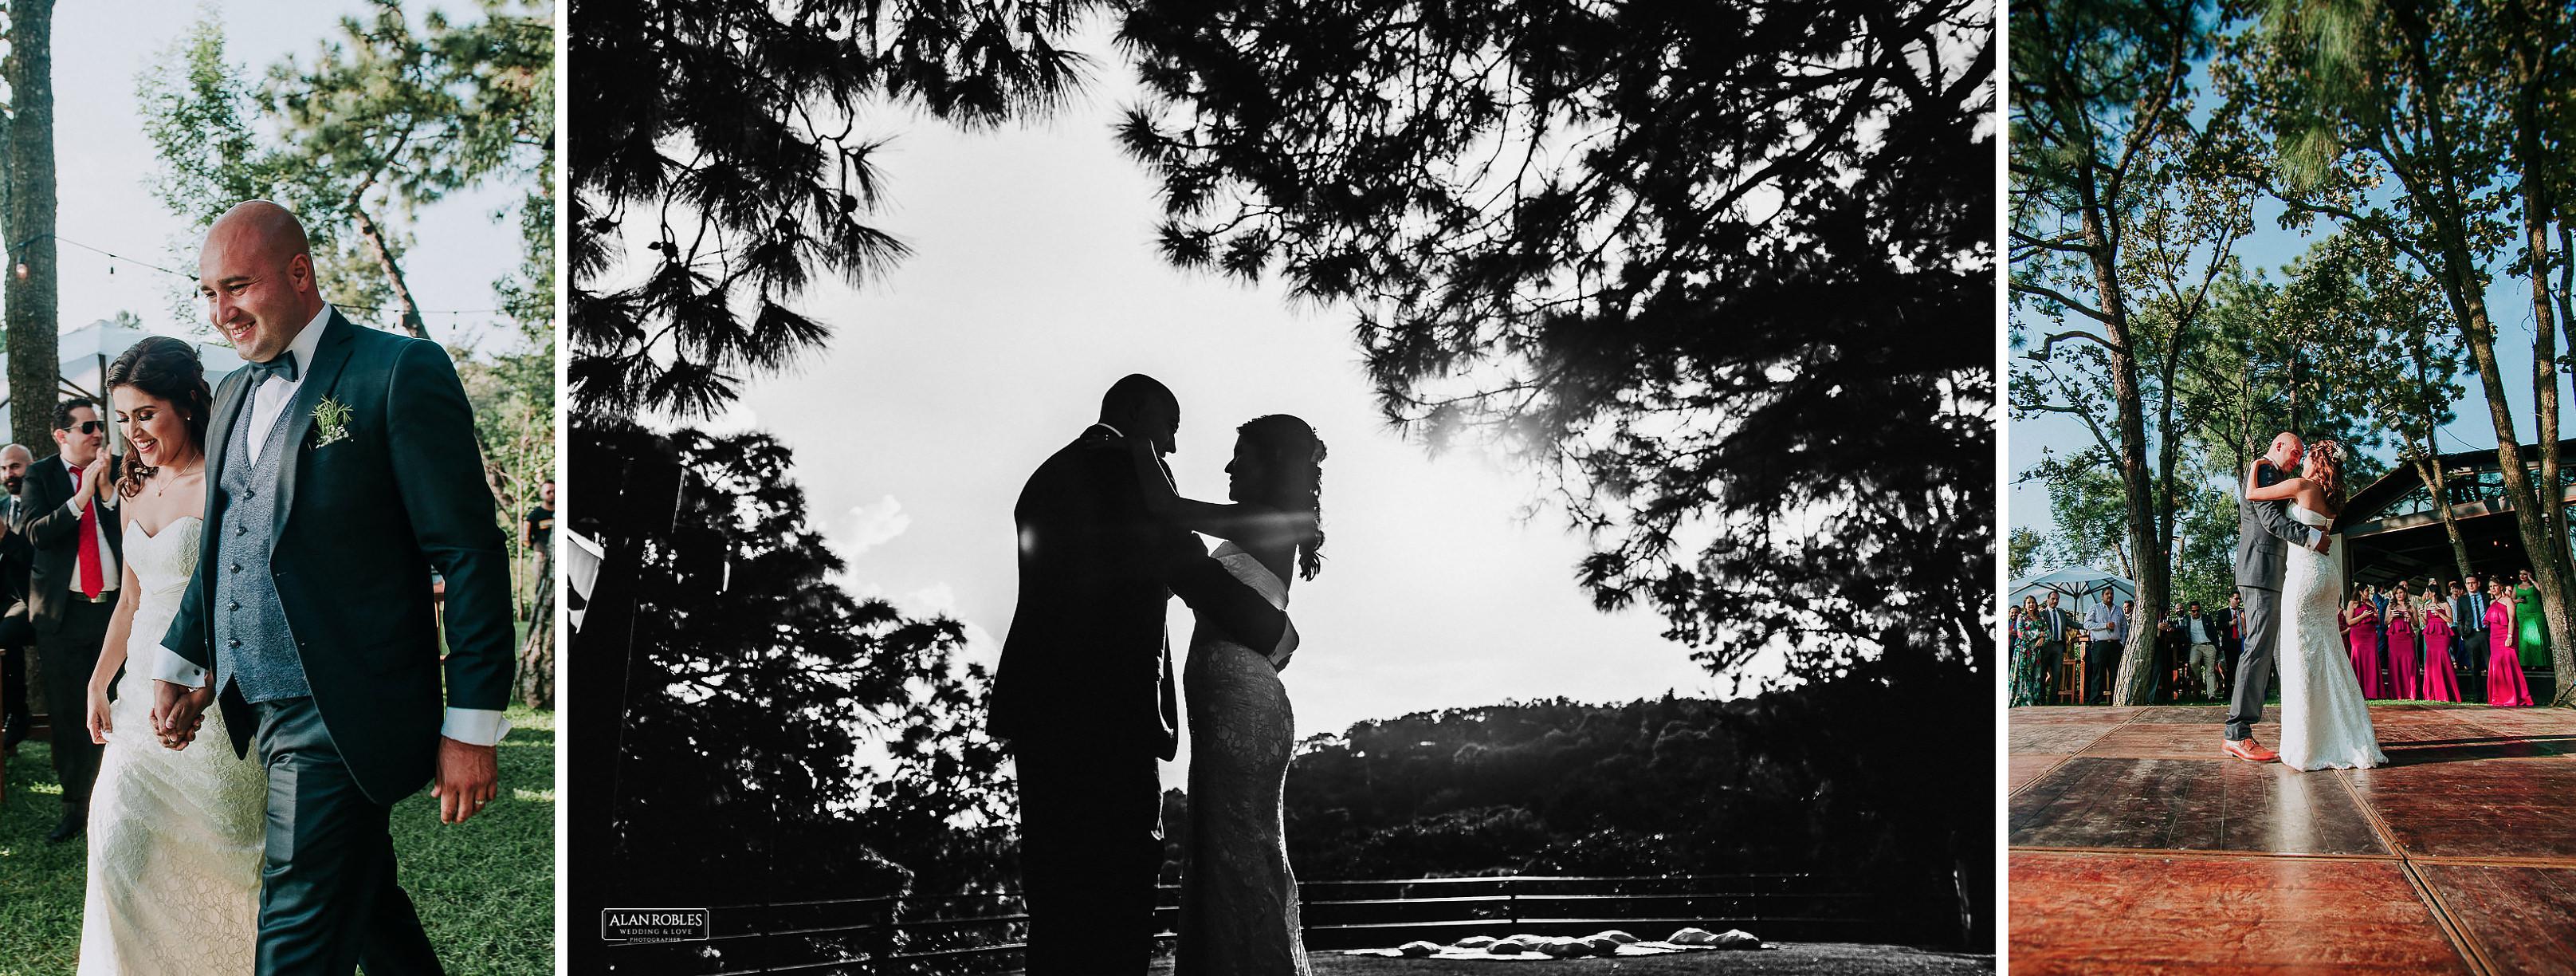 Fotografo de bodas guadalajara Alan Robles - Pinare terraza bistro 47